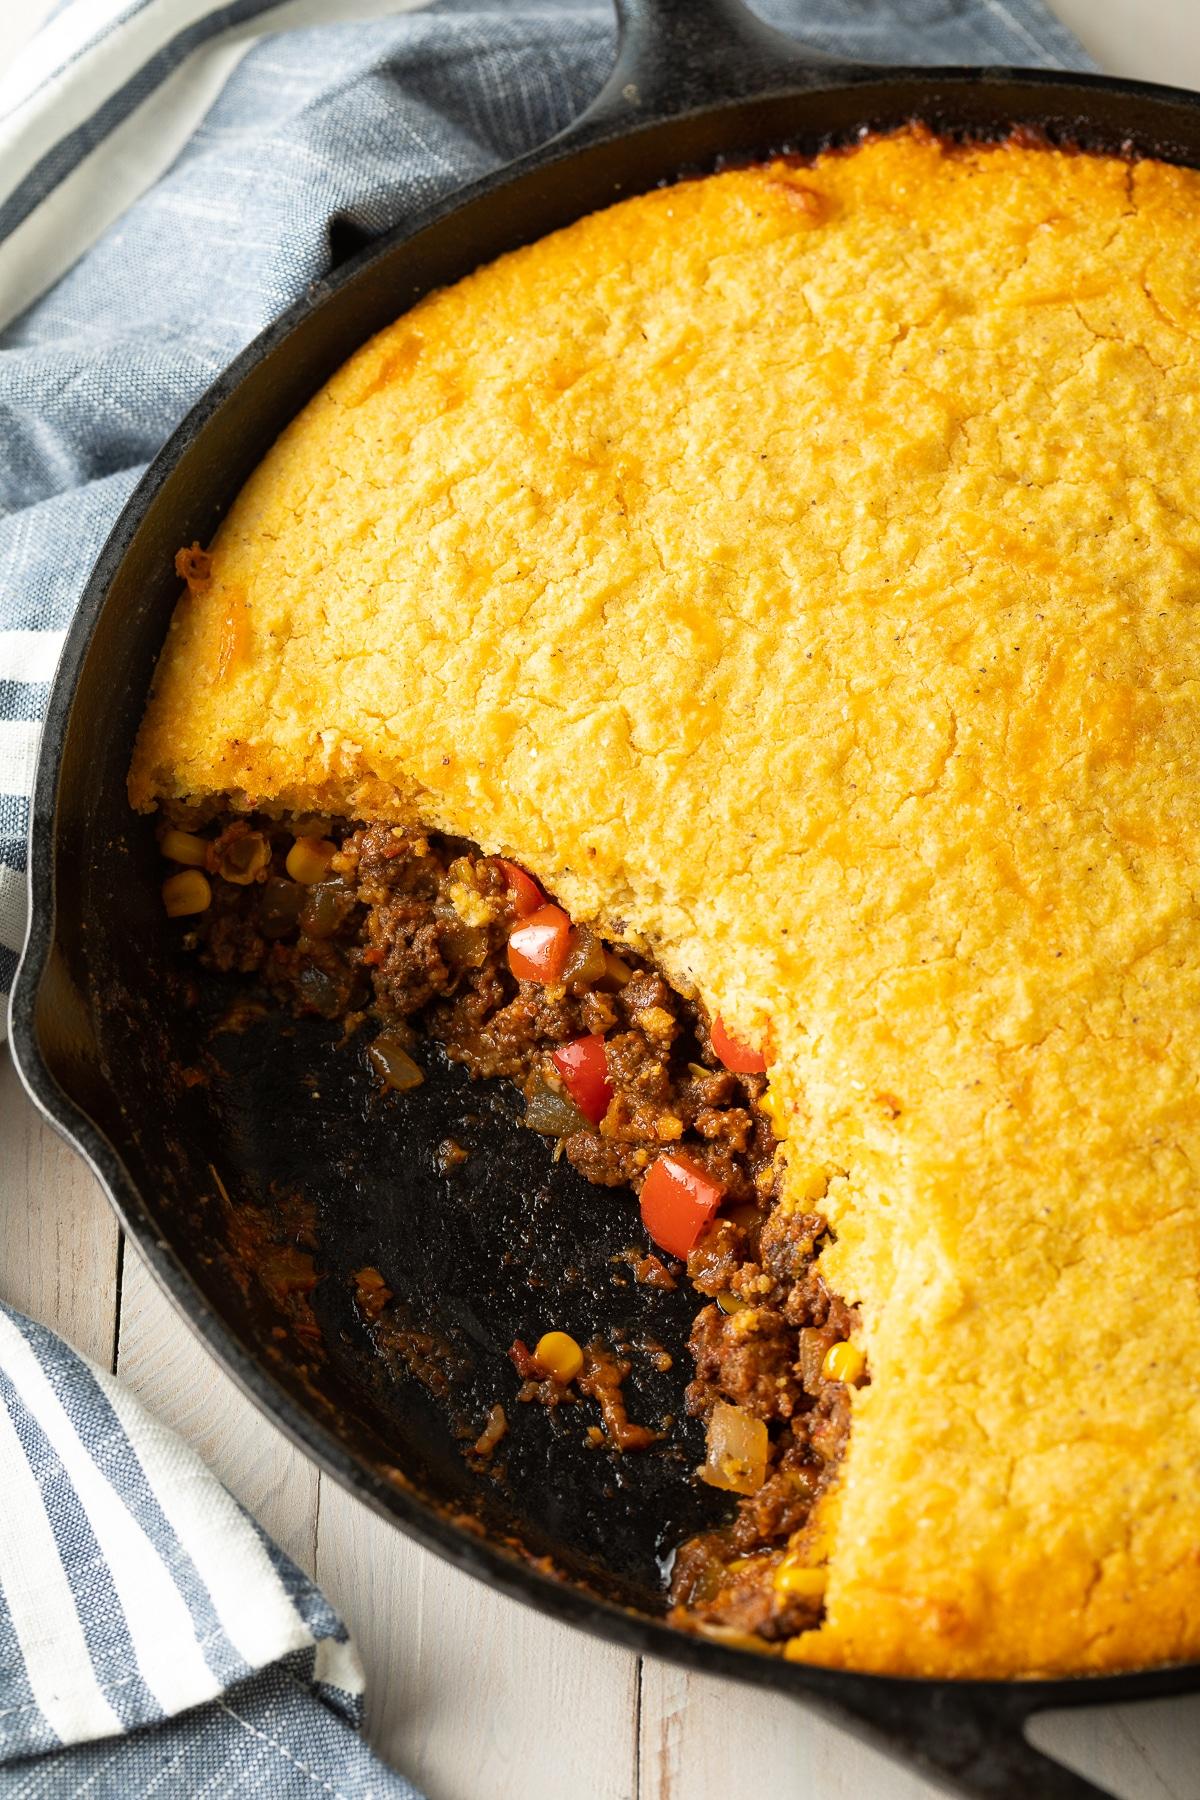 Best Tamale Pie Recipe - Easy to Make and Gluten Free! #tamales #tamalepie #glutenfreedinner #glutenfreerecipe #aspicyperspective